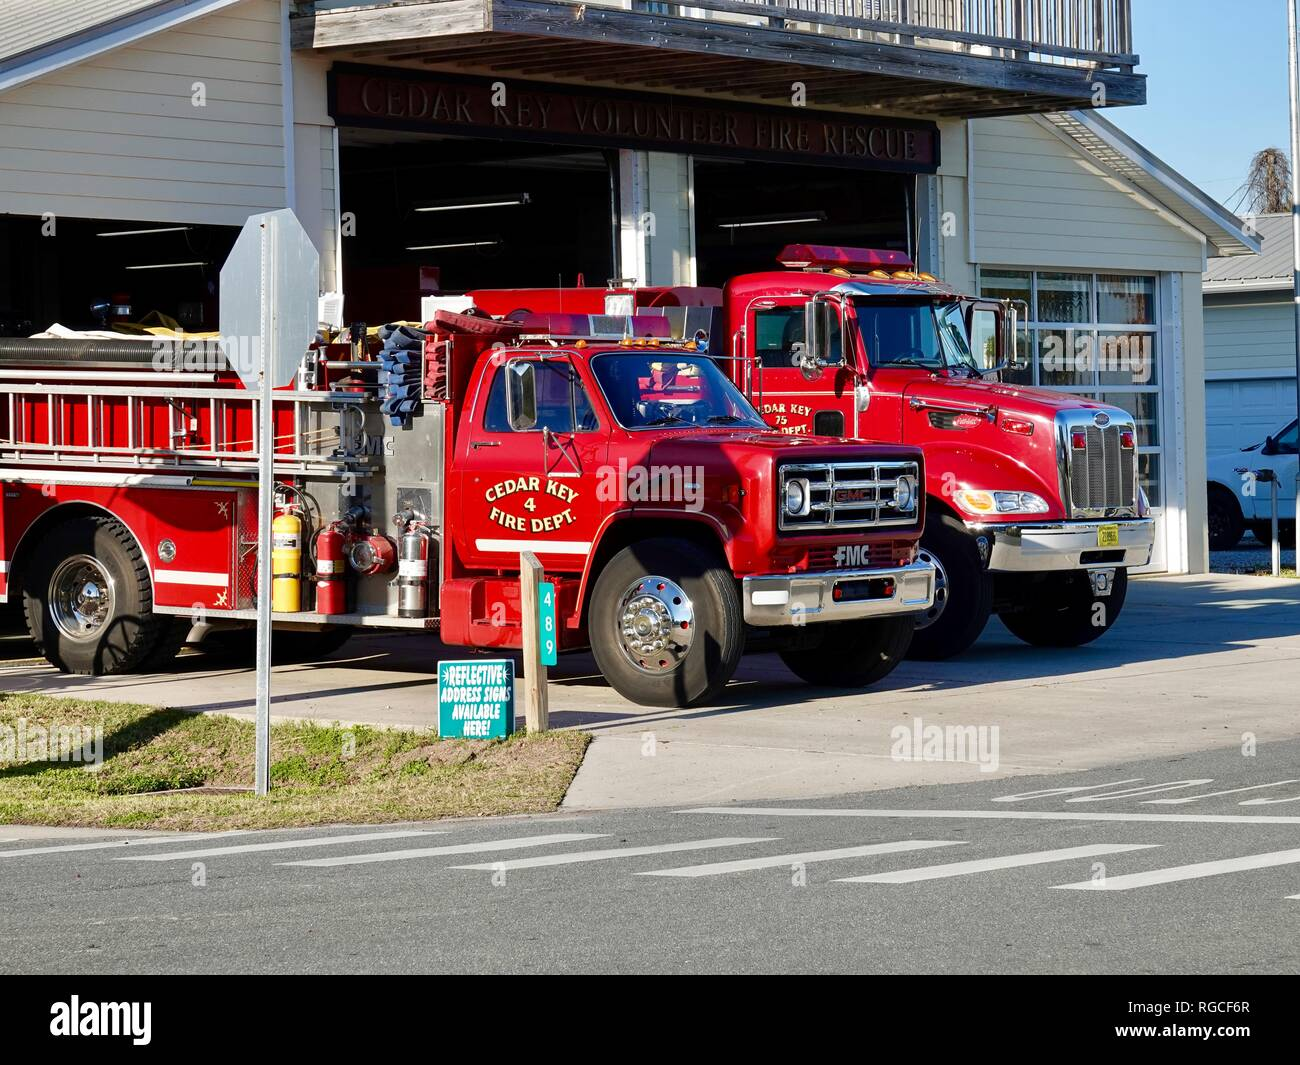 Cedar Key Volunteer Fire Rescue Department, Florida, USA. - Stock Image